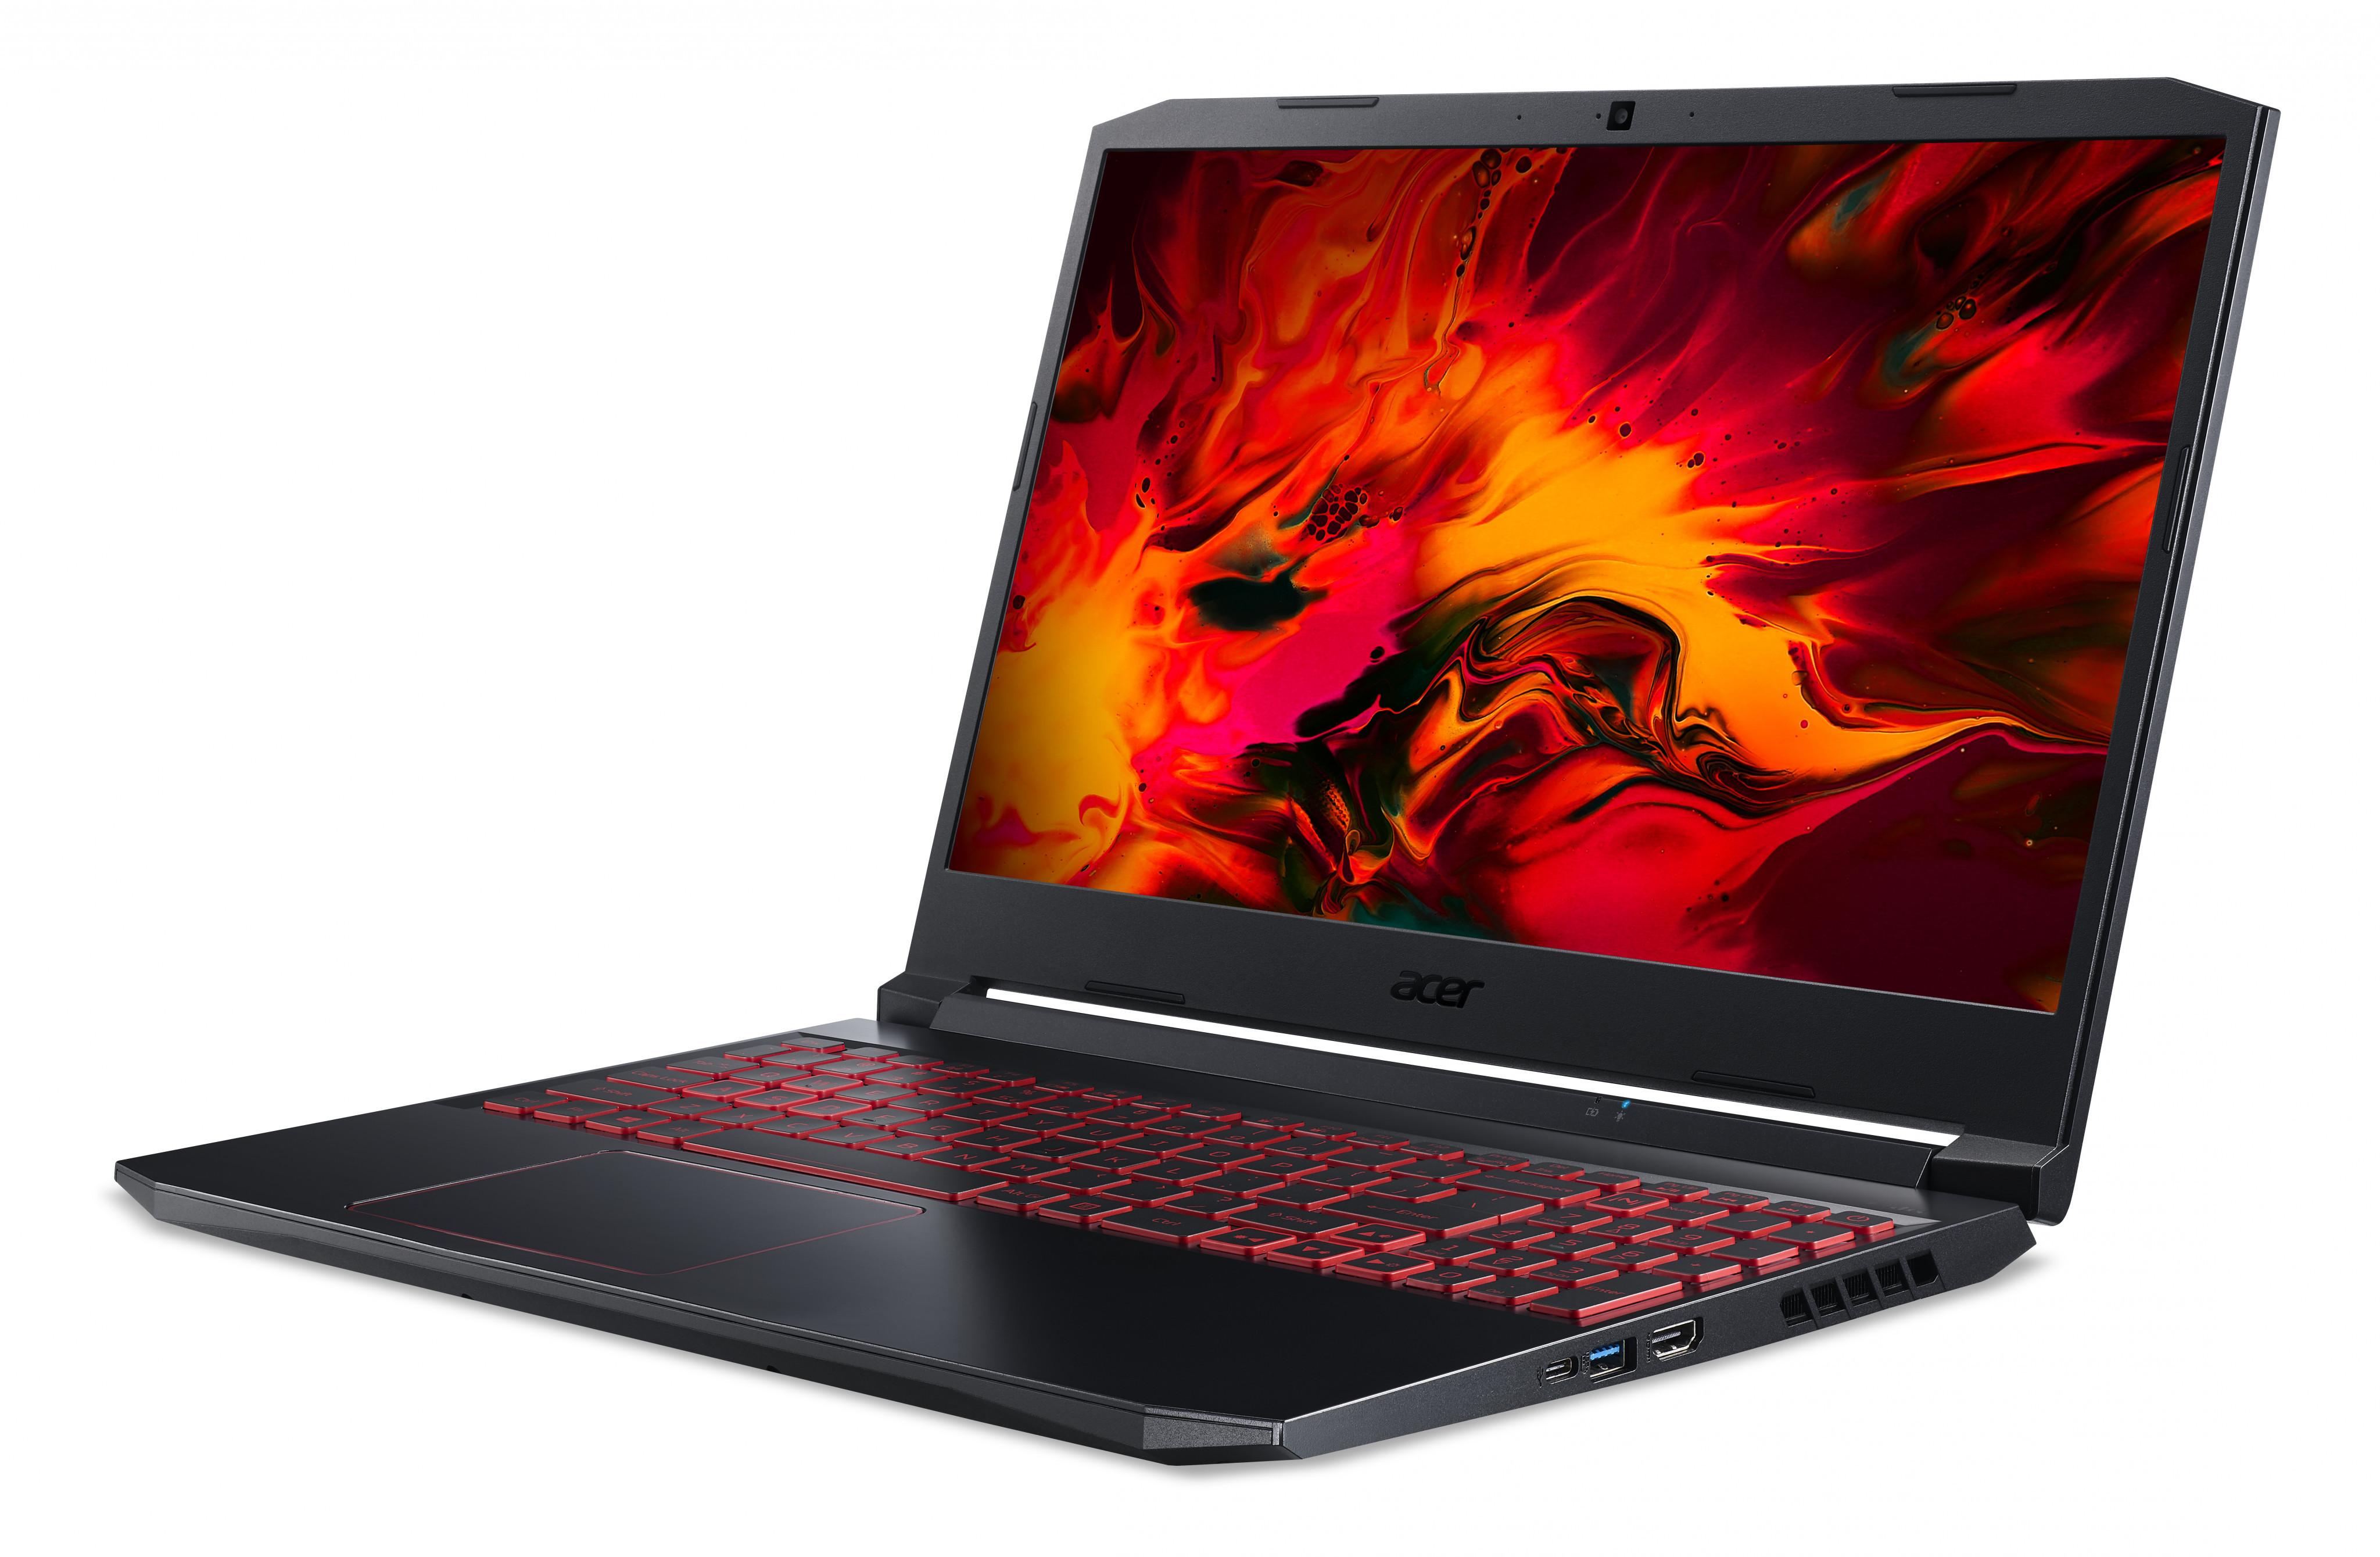 YEPO Laptop 13.3 inch IPS Screen Ultrabook Gaming Laptops Intel J3455 Windows10 Notebook